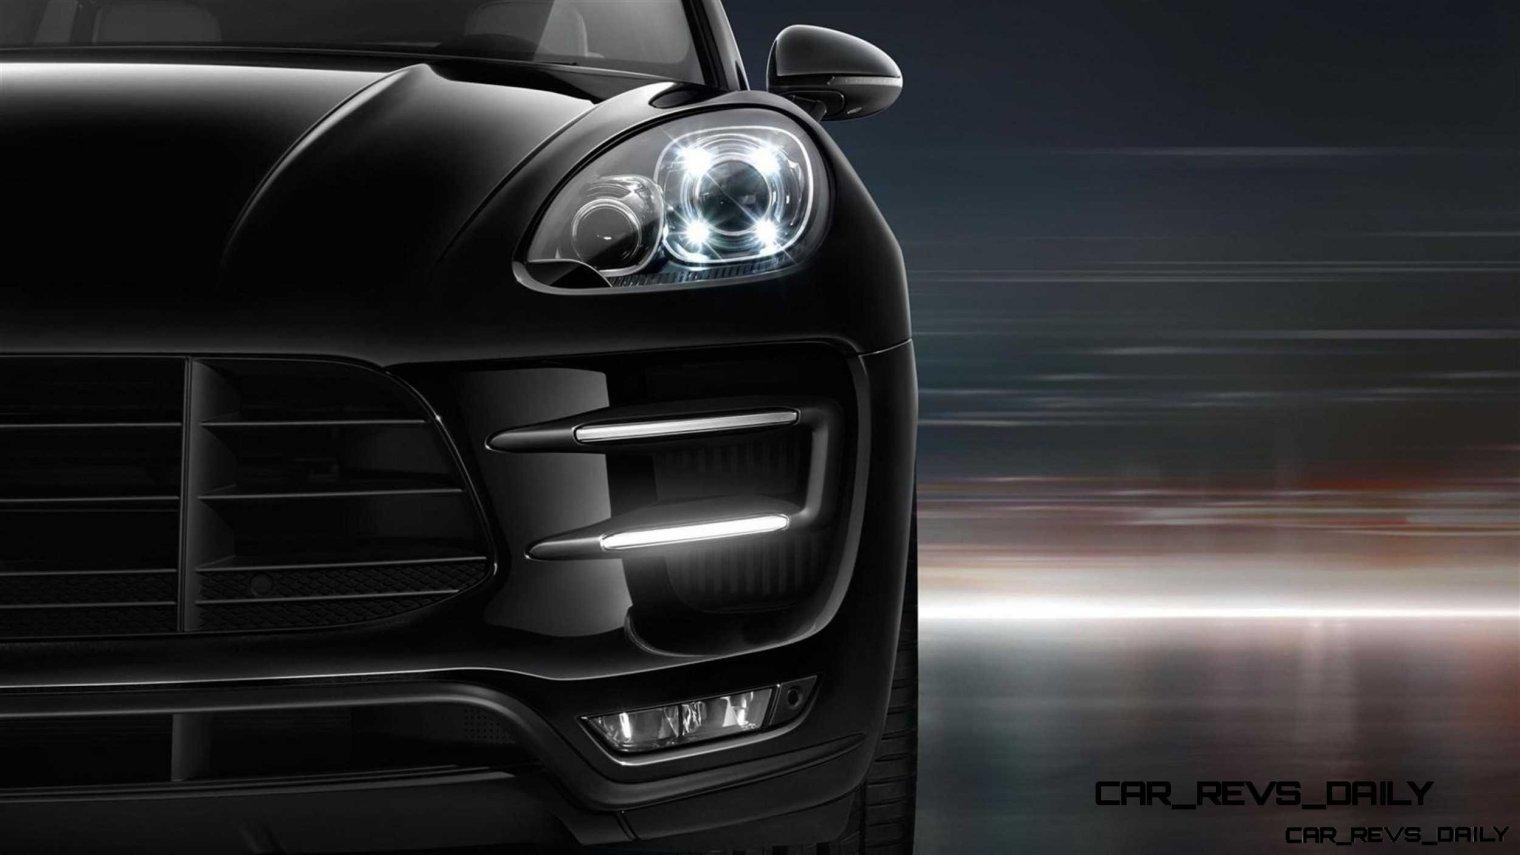 2015 Porsche Macan - Latest Images - CarRevsDaily.com 13